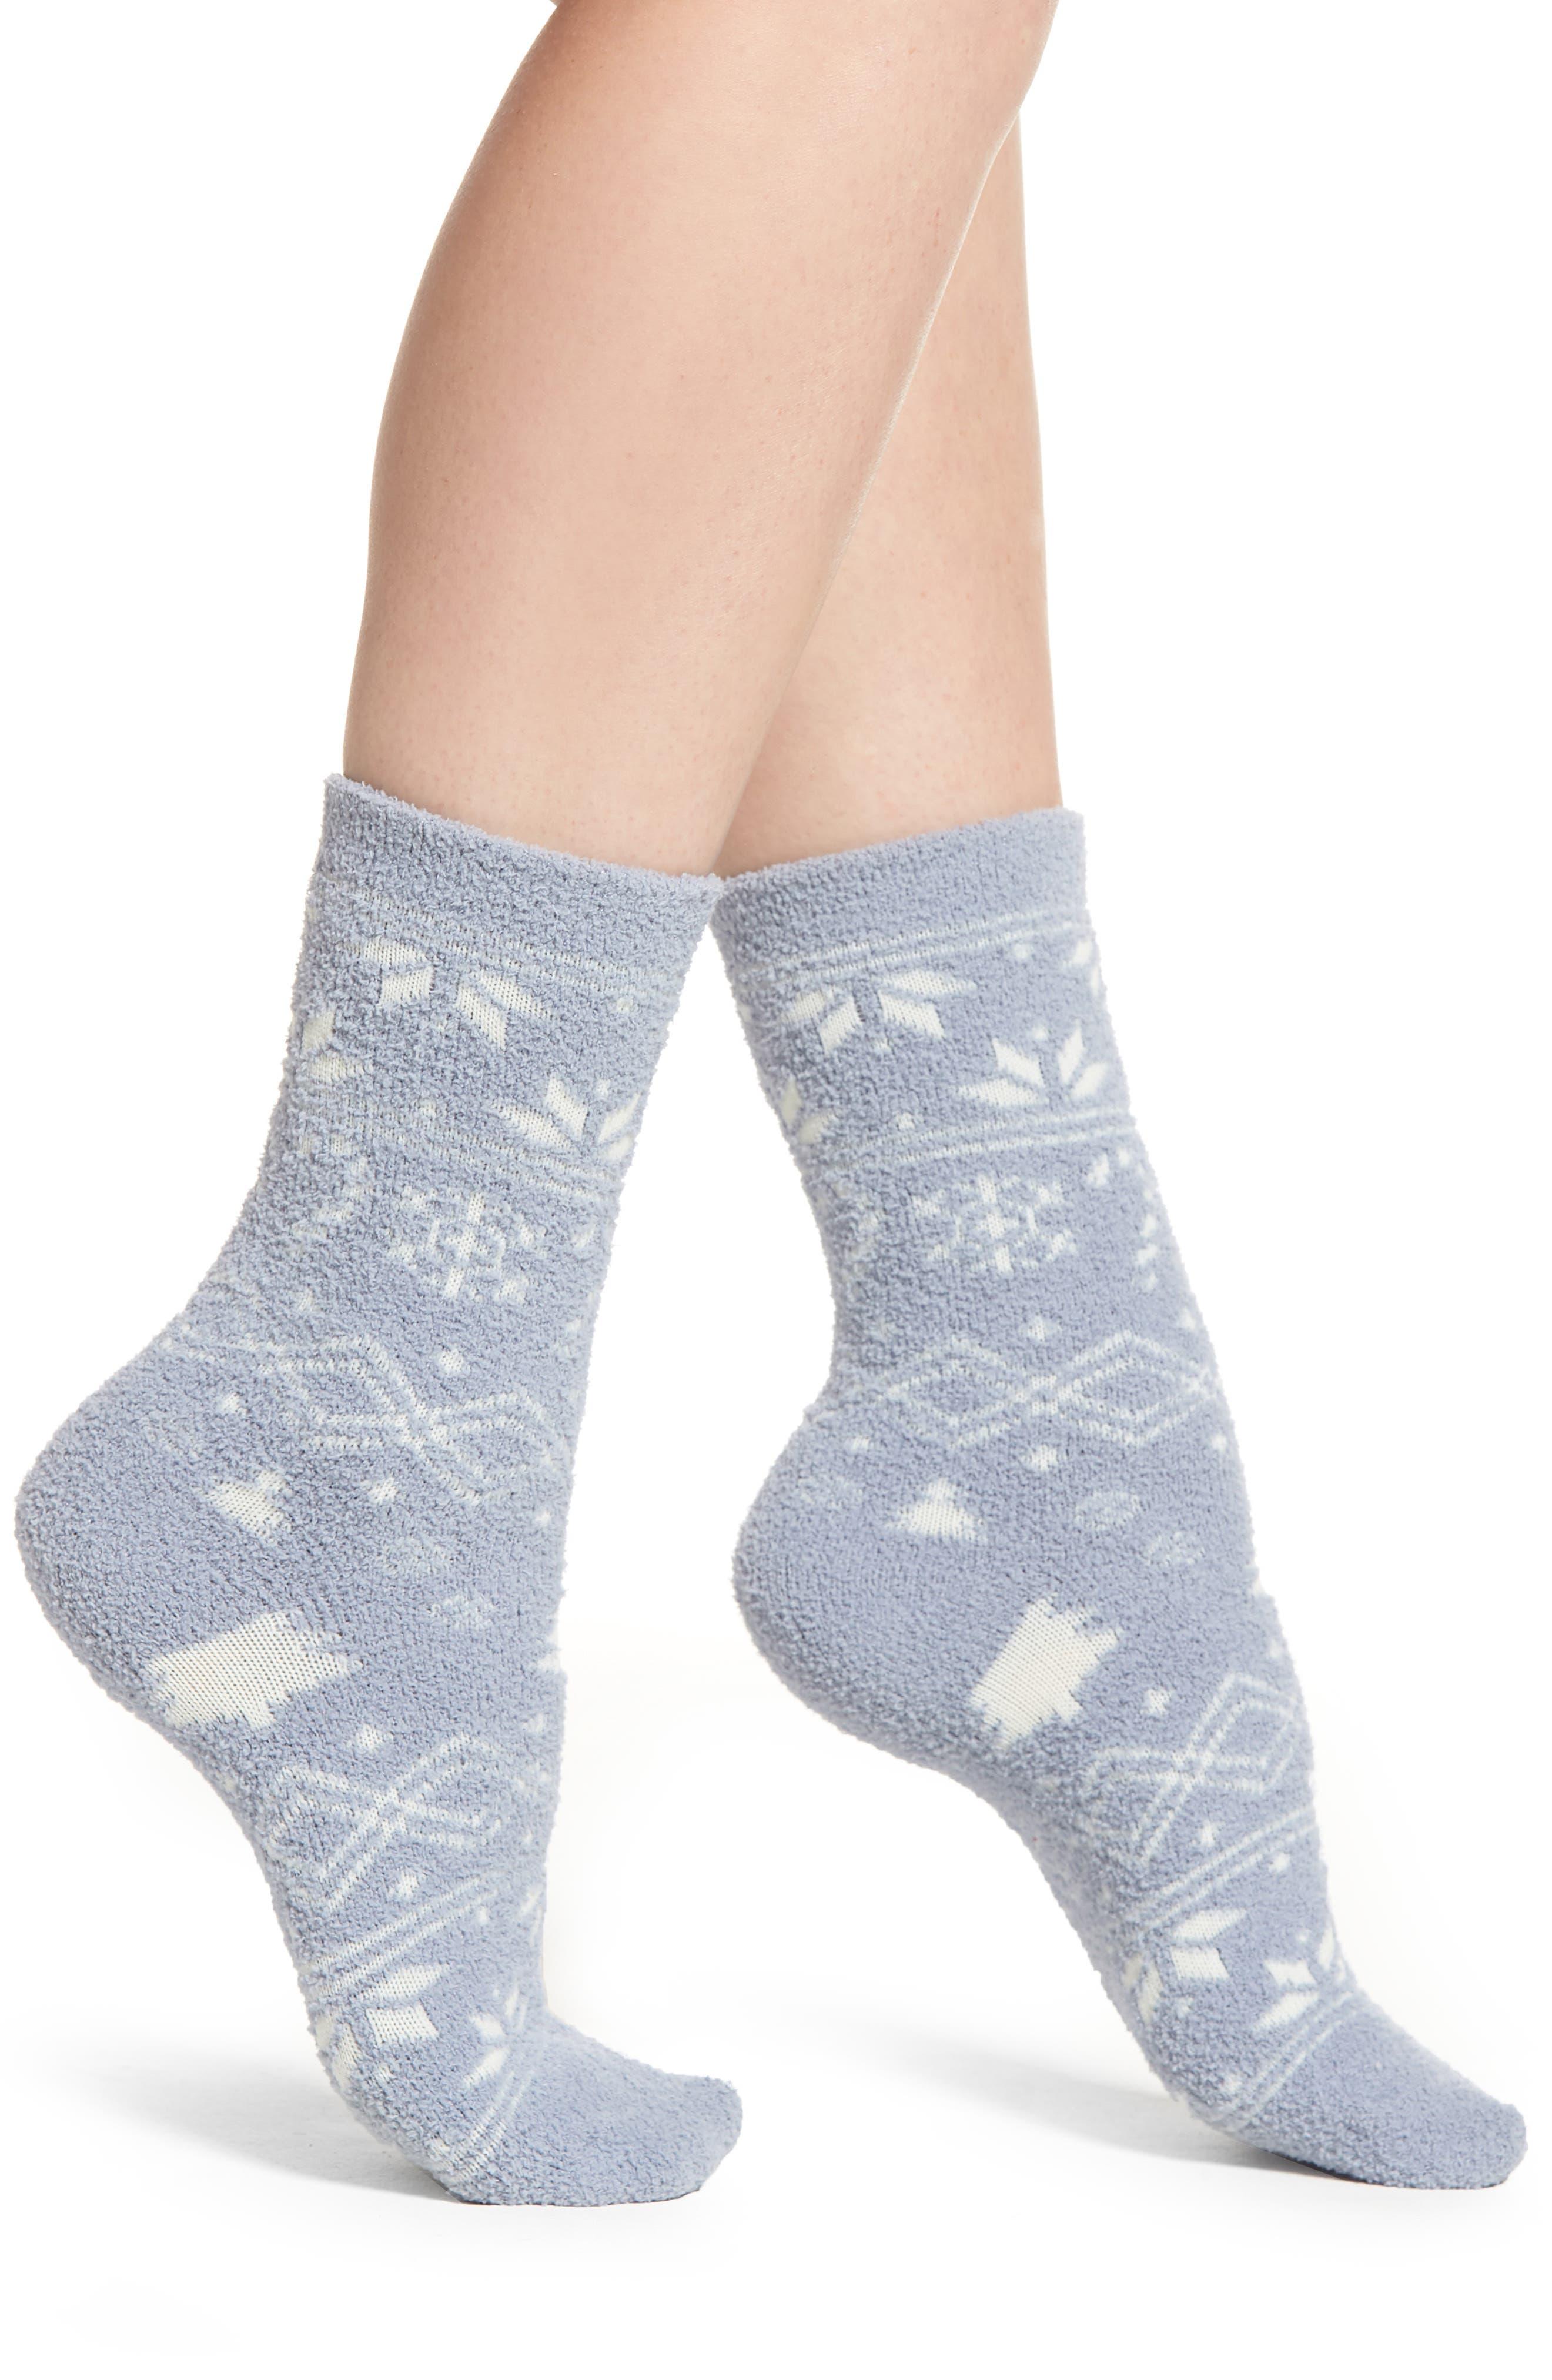 Chamois Crew Socks,                         Main,                         color, BLUE FAIRISLE